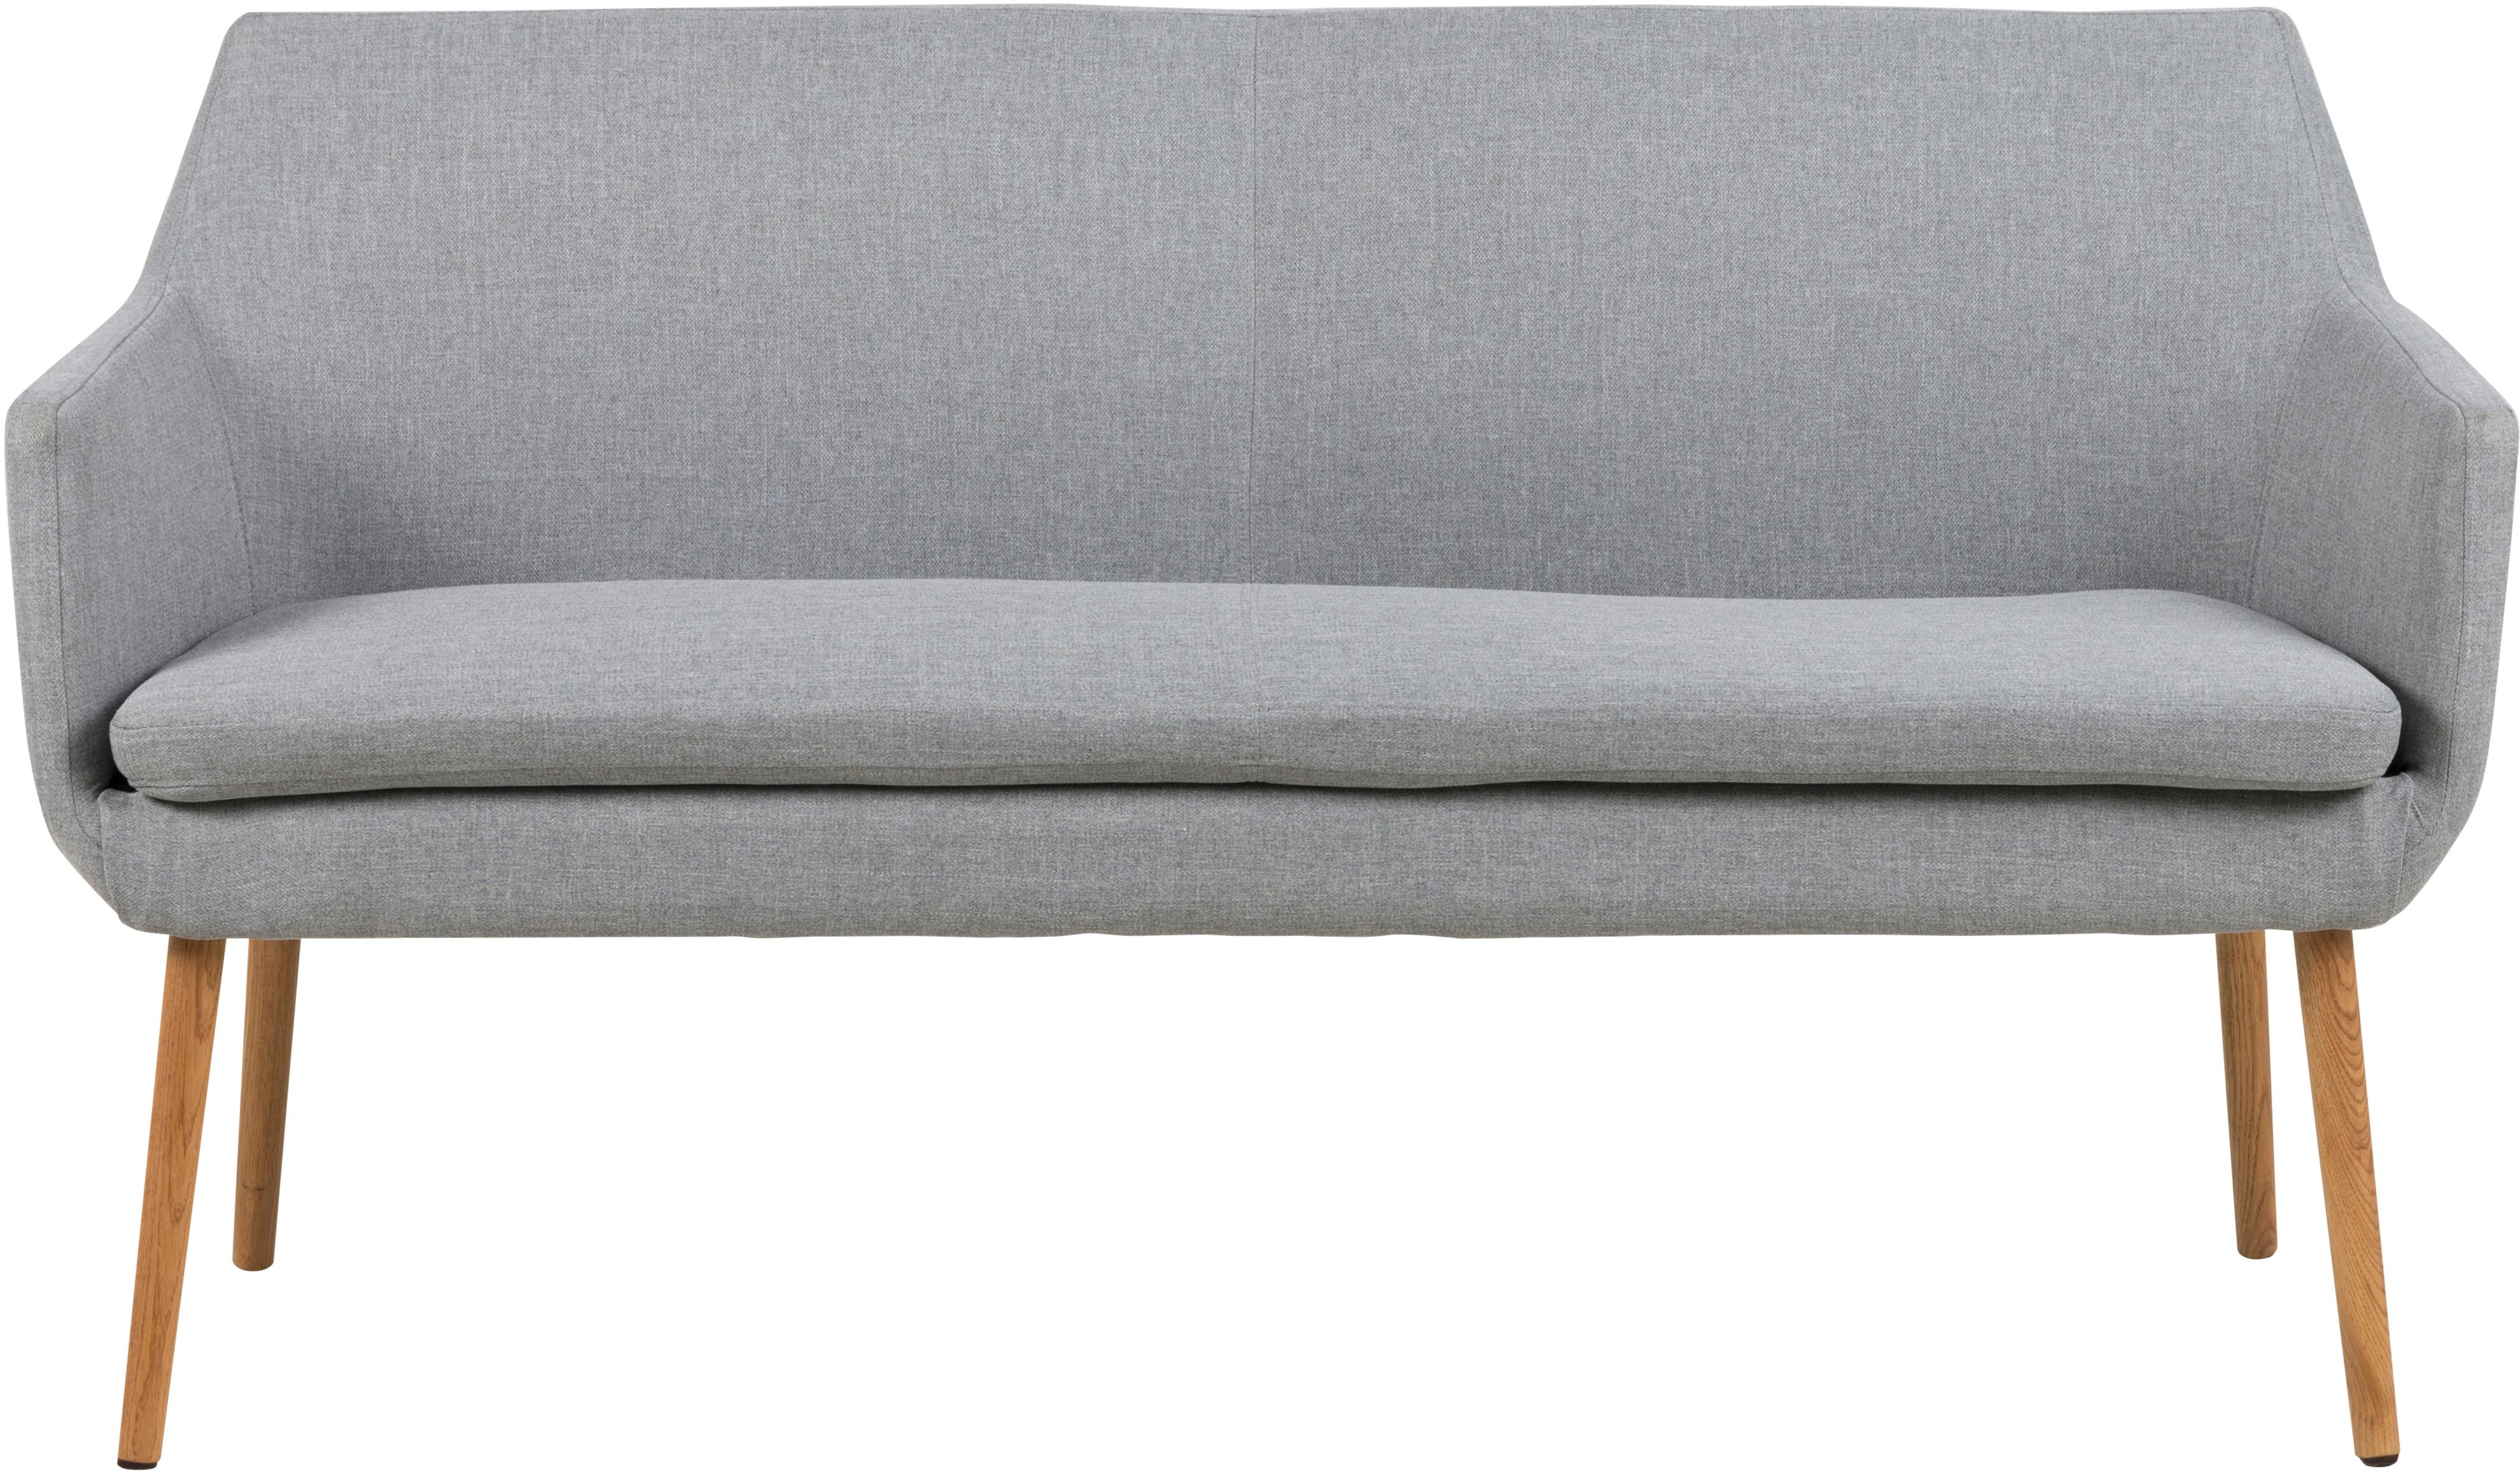 Graue Esszimmerbank Nora mit Lehne, Bezug: 100% Polyester, Gestell: Eichenholz, Bezug: Grau<br>Gestell: Eichenholz, 159 x 86 cm